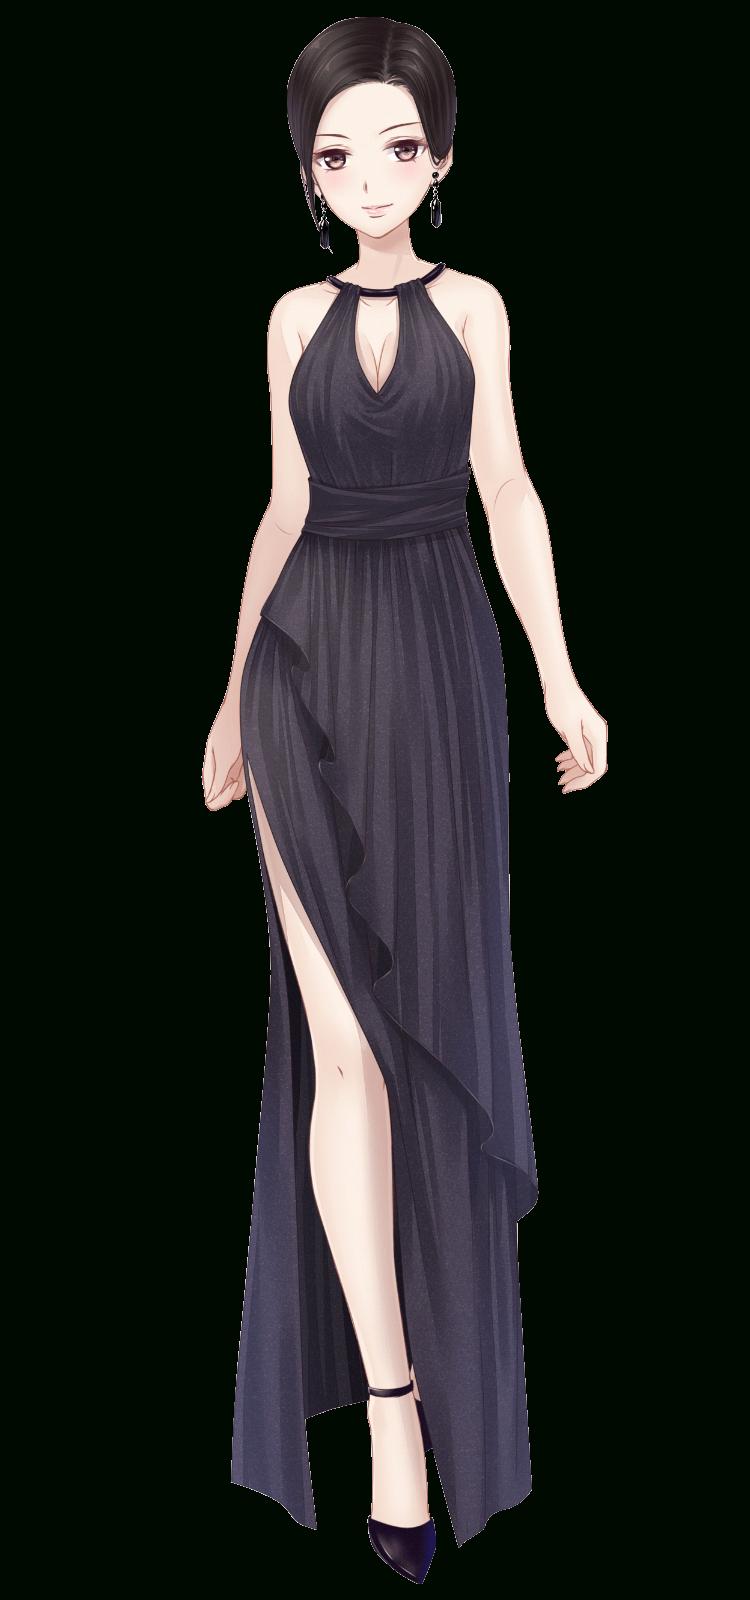 Abend Top Abend Dress Name Boutique17 Kreativ Abend Dress Name Design